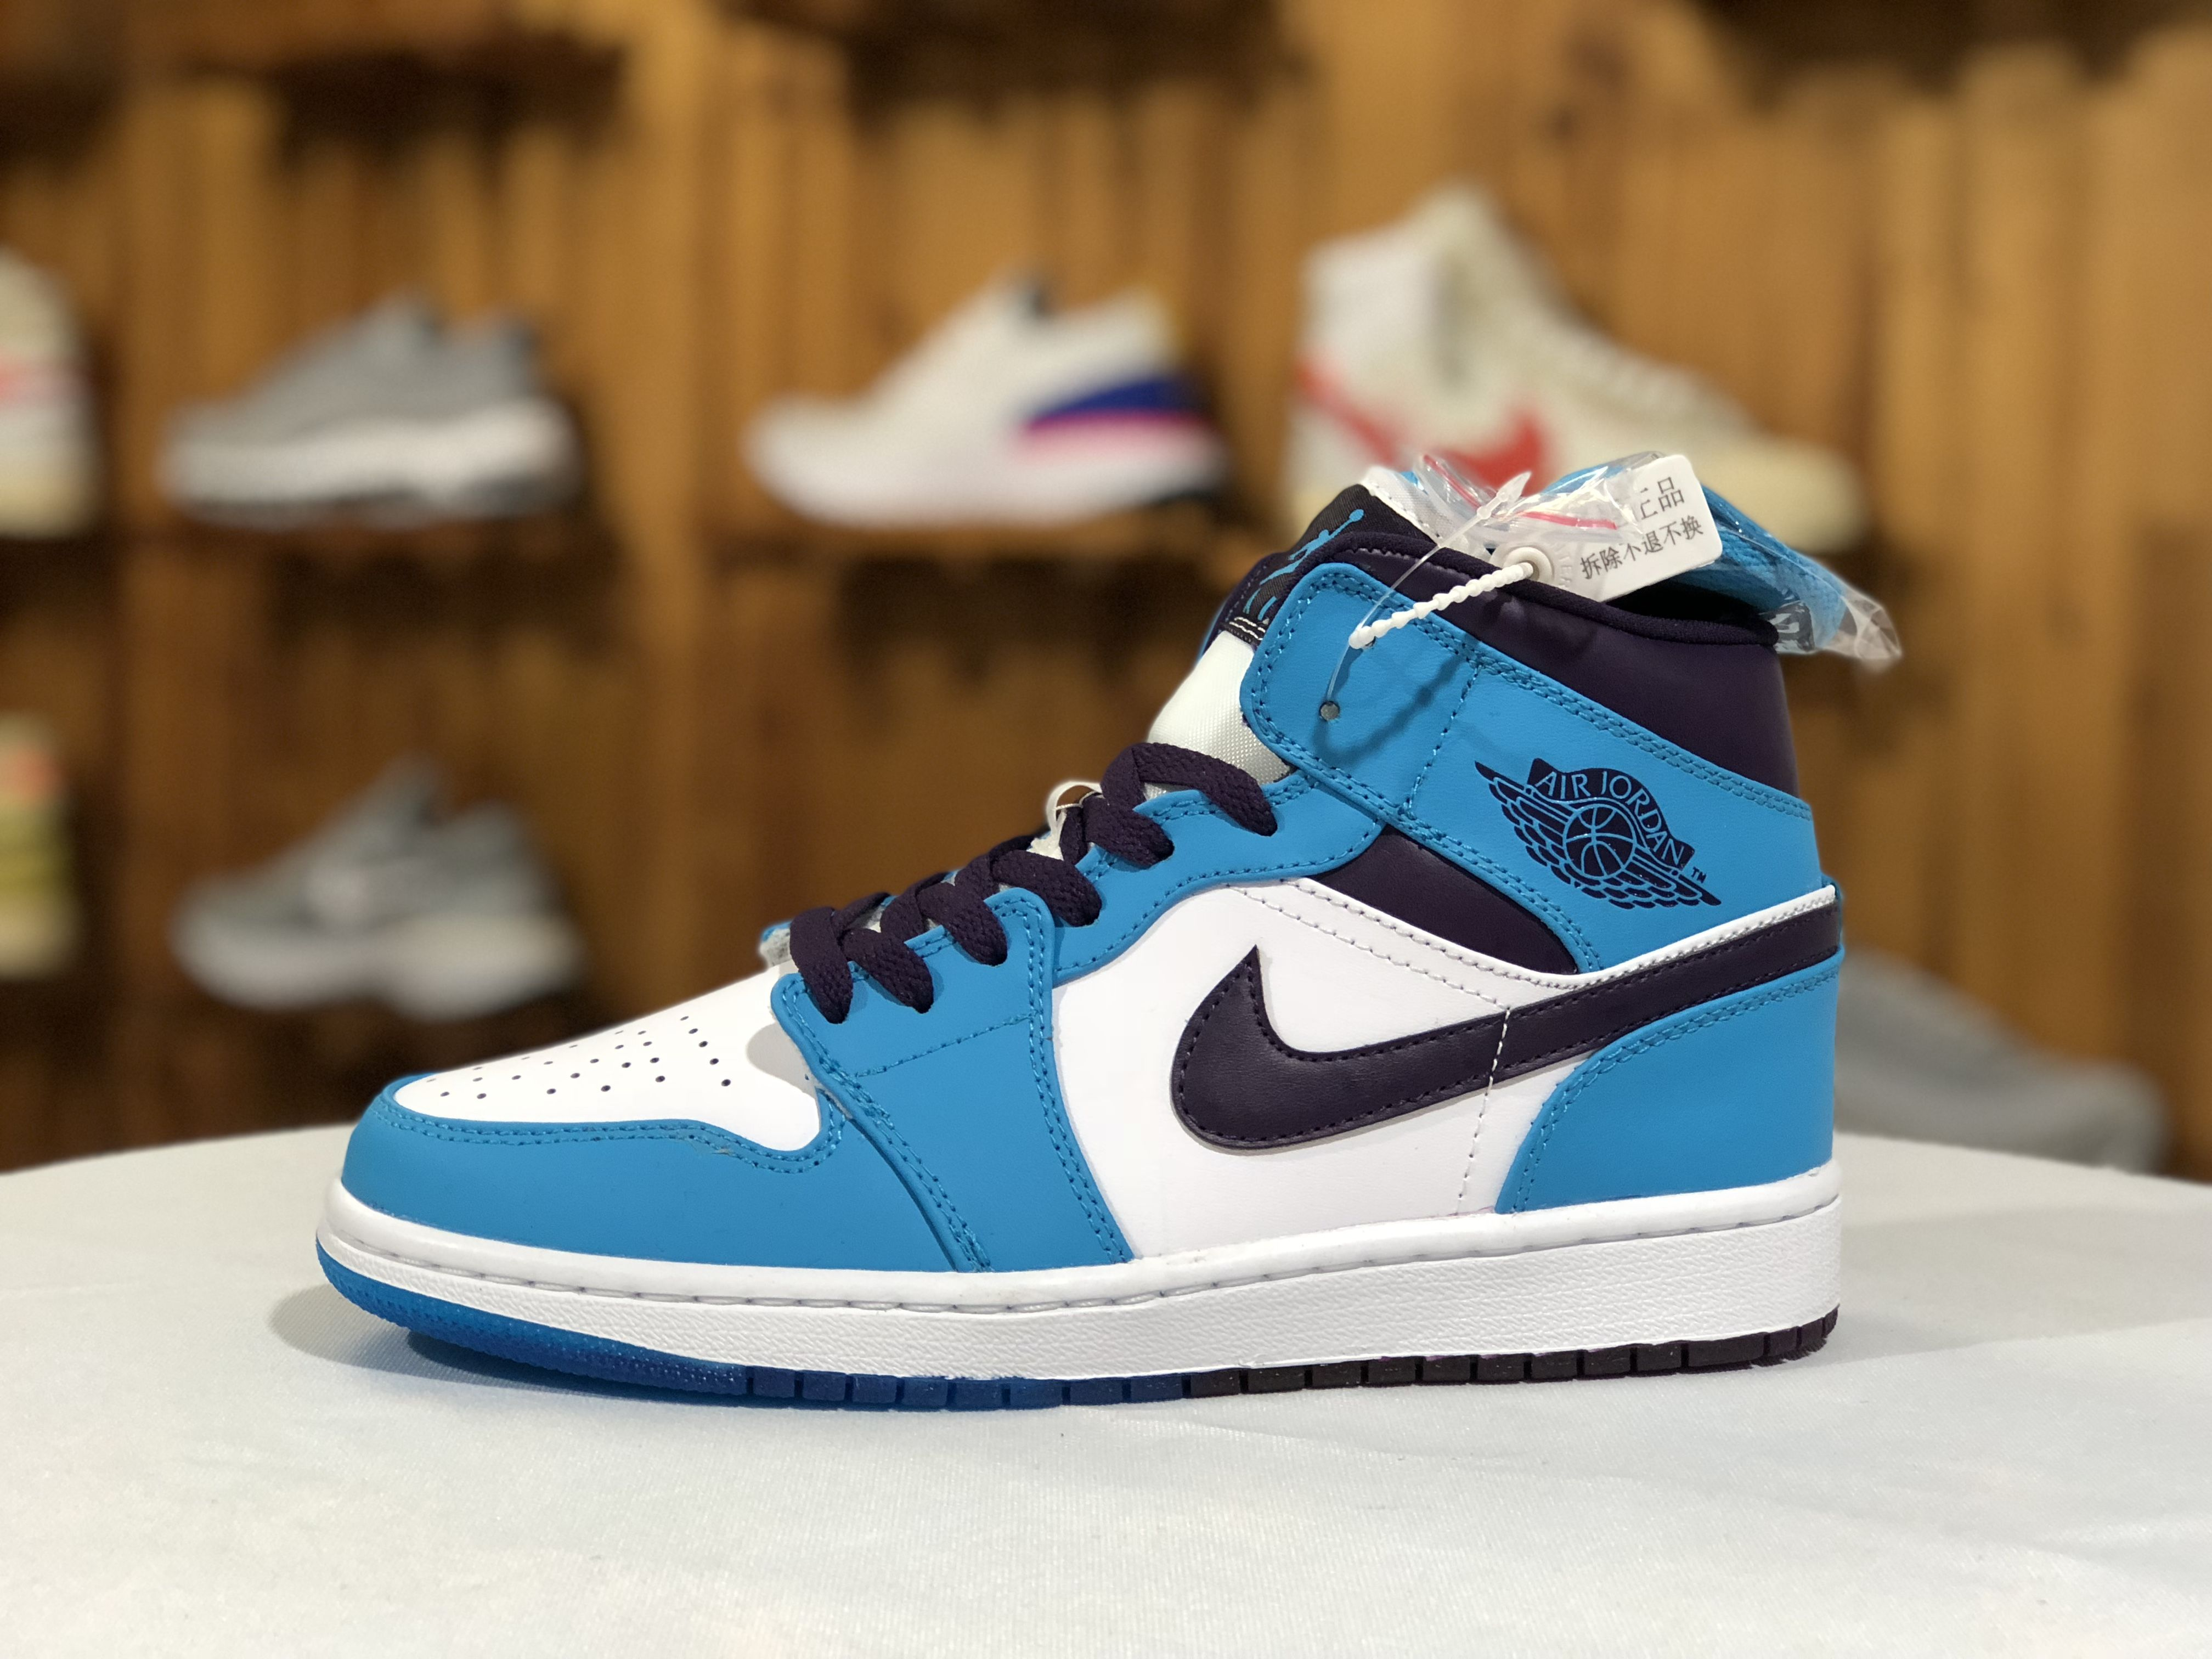 Air Jordan 1 Mid Hornets Blue Purple Basketball Shoes For Men Jordan Shoes For Men Purple Basketball Shoes Air Jordans